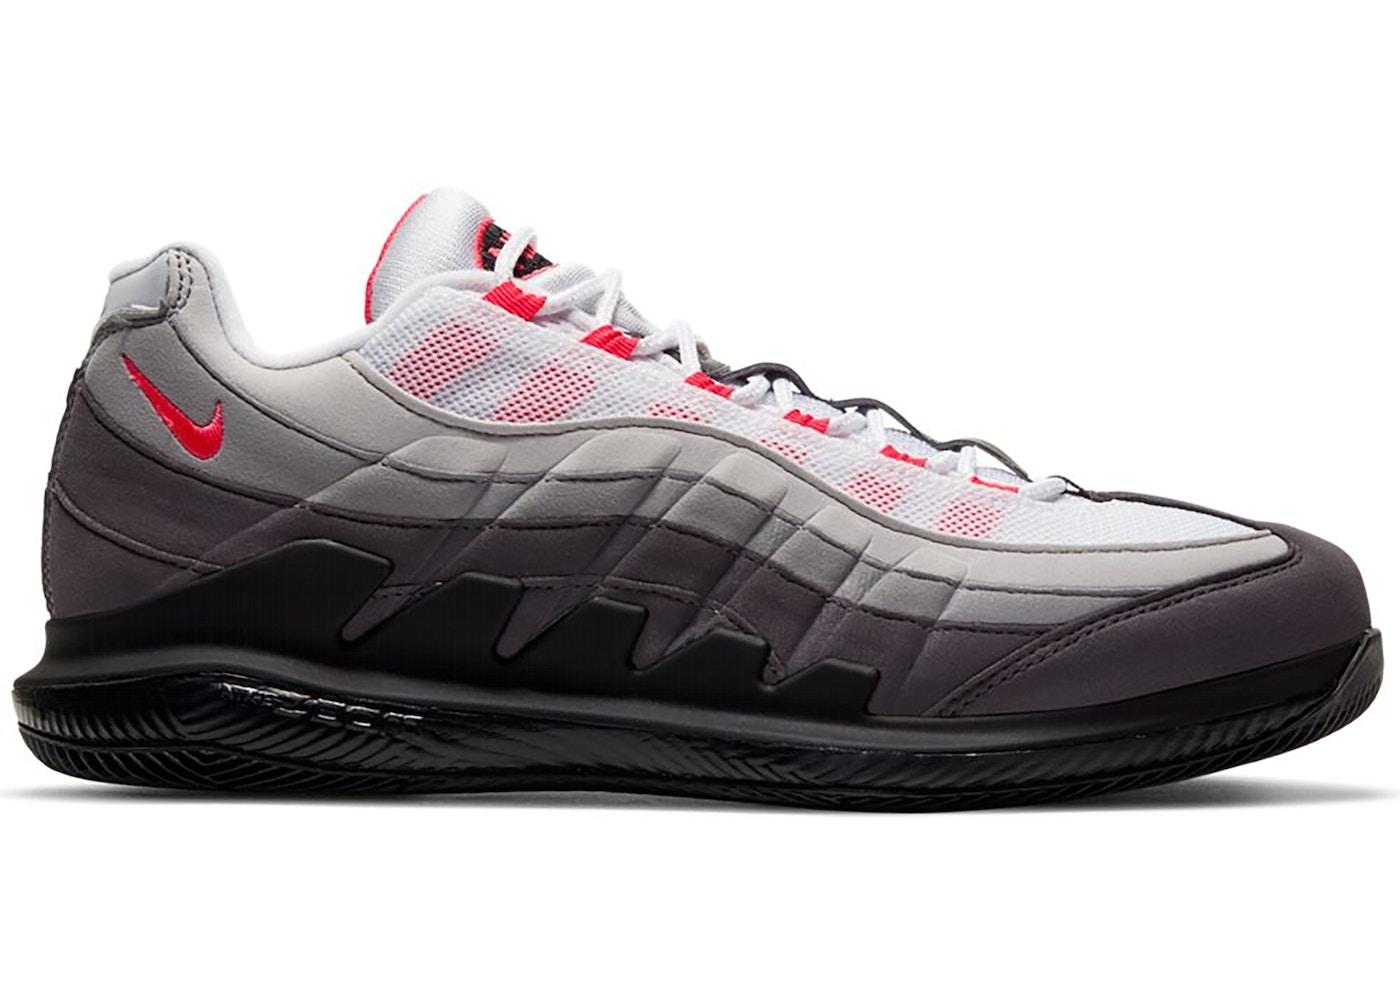 NikeCourt Zoom Vapor X Air Max 95 Solar Red